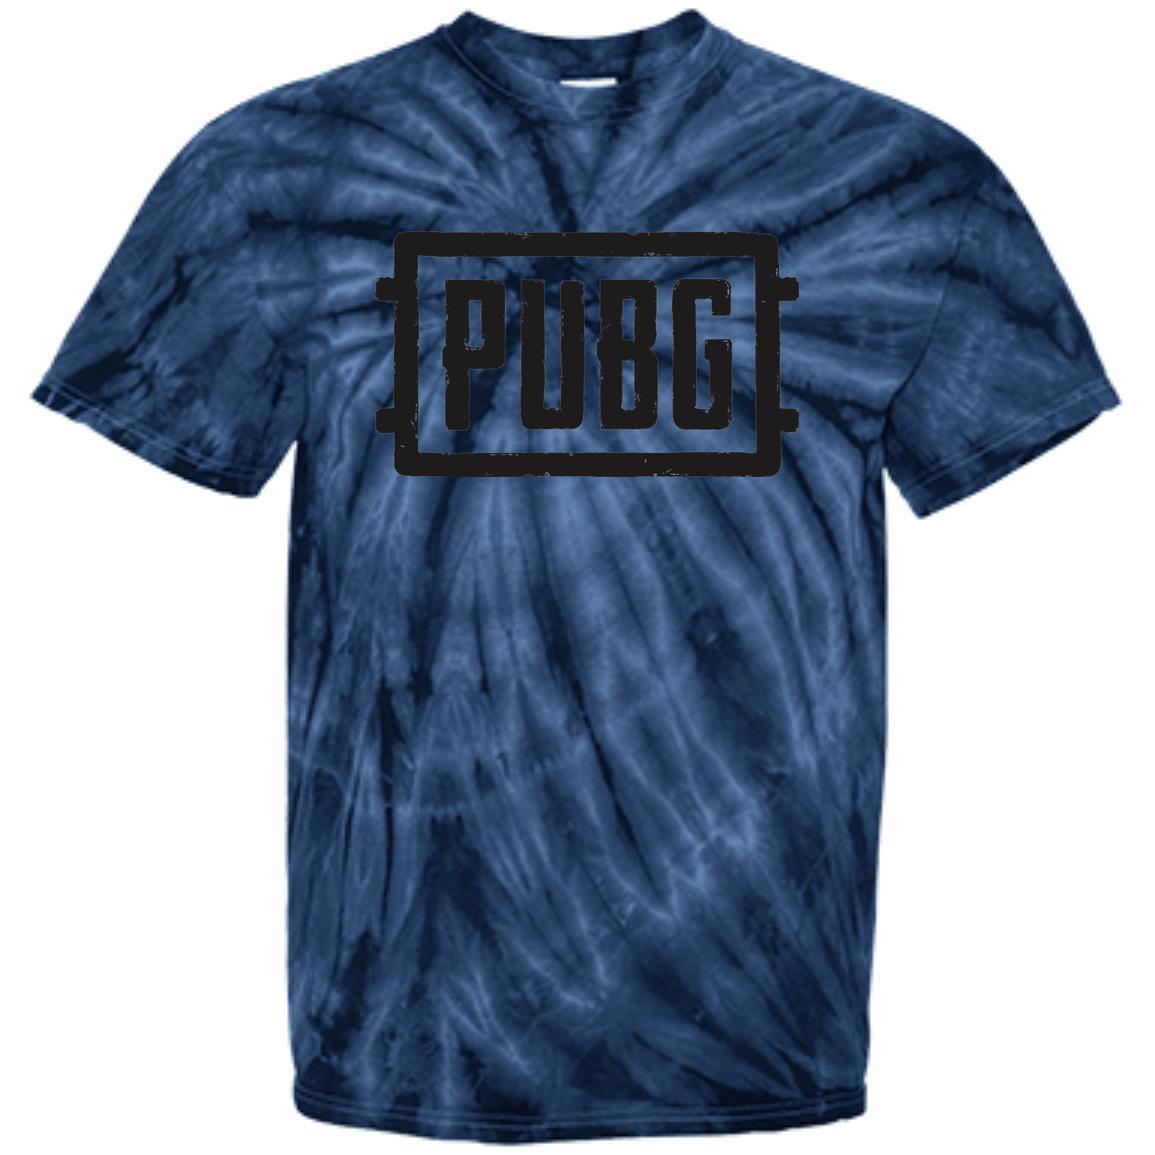 Post malone pubg tie dye t shirt rockatee for Custom t shirts tie dye